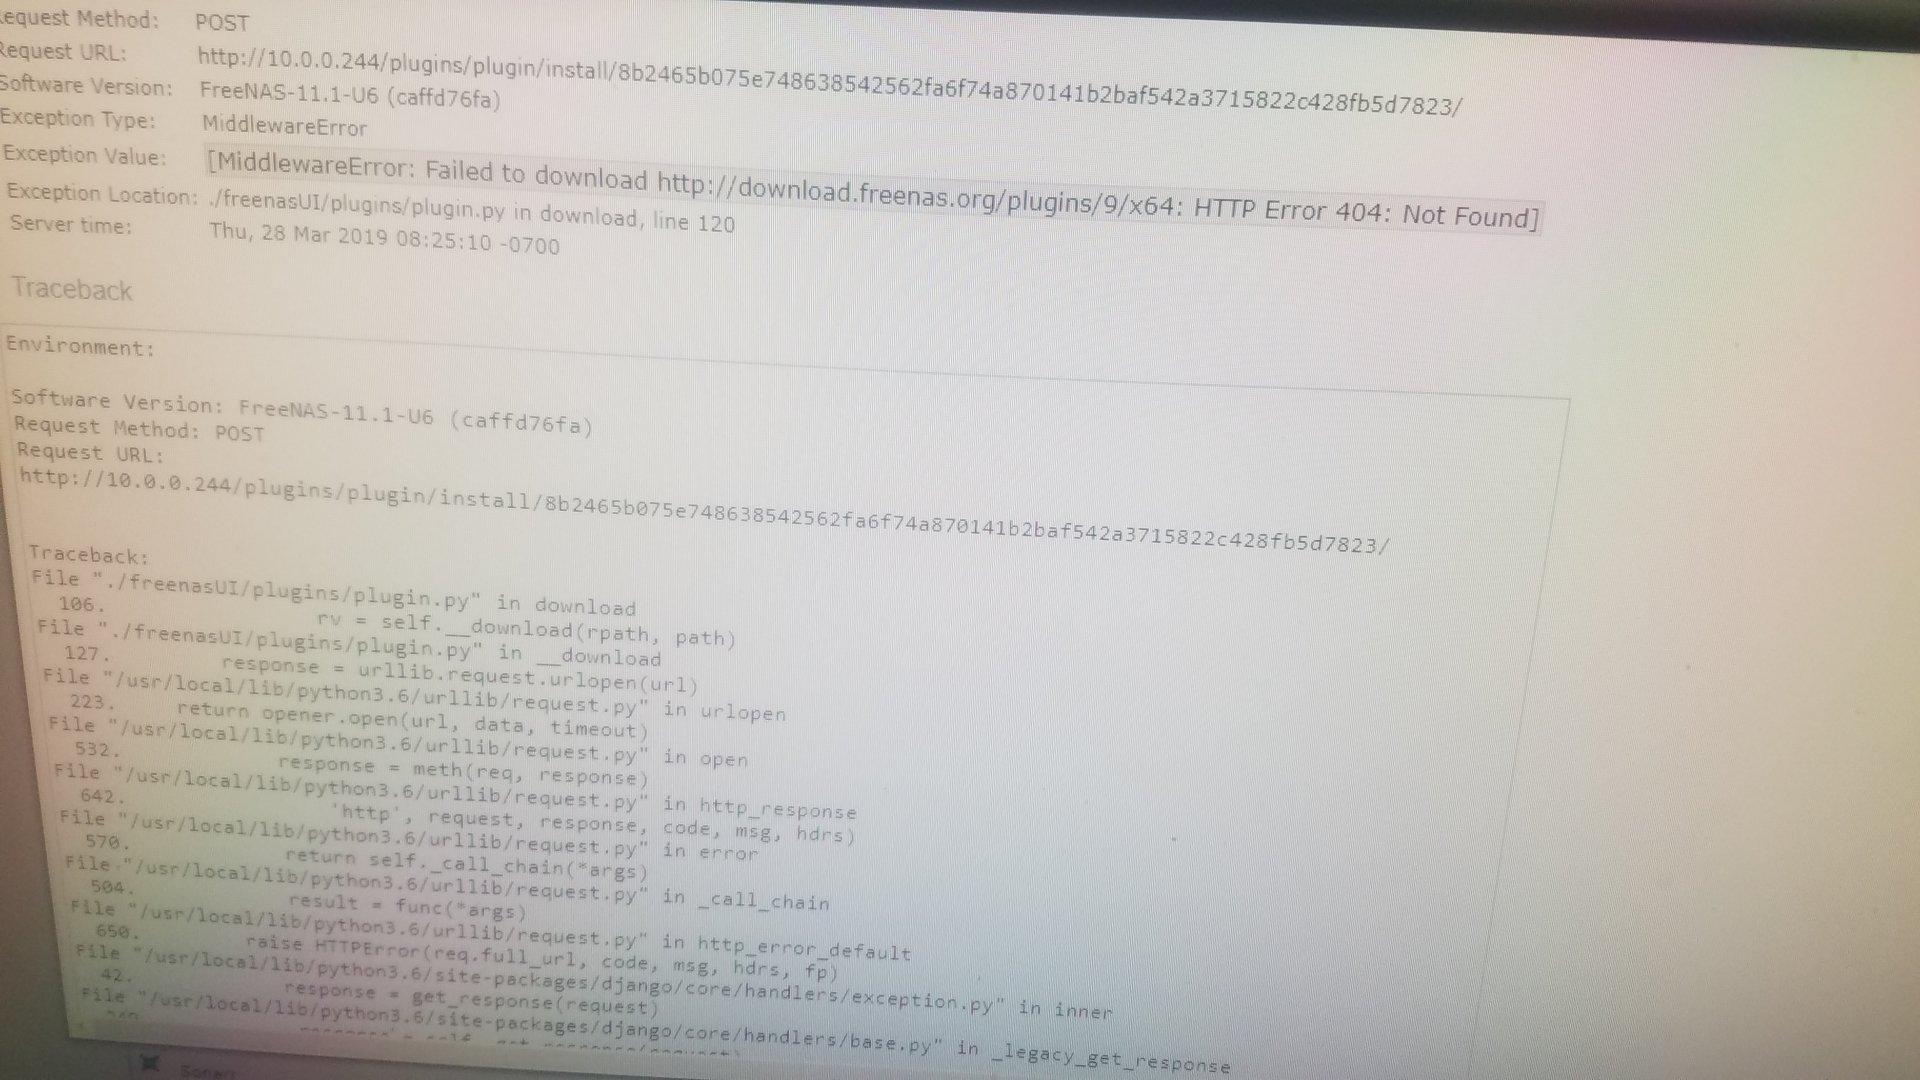 PLEX plugin not available | iXsystems Community